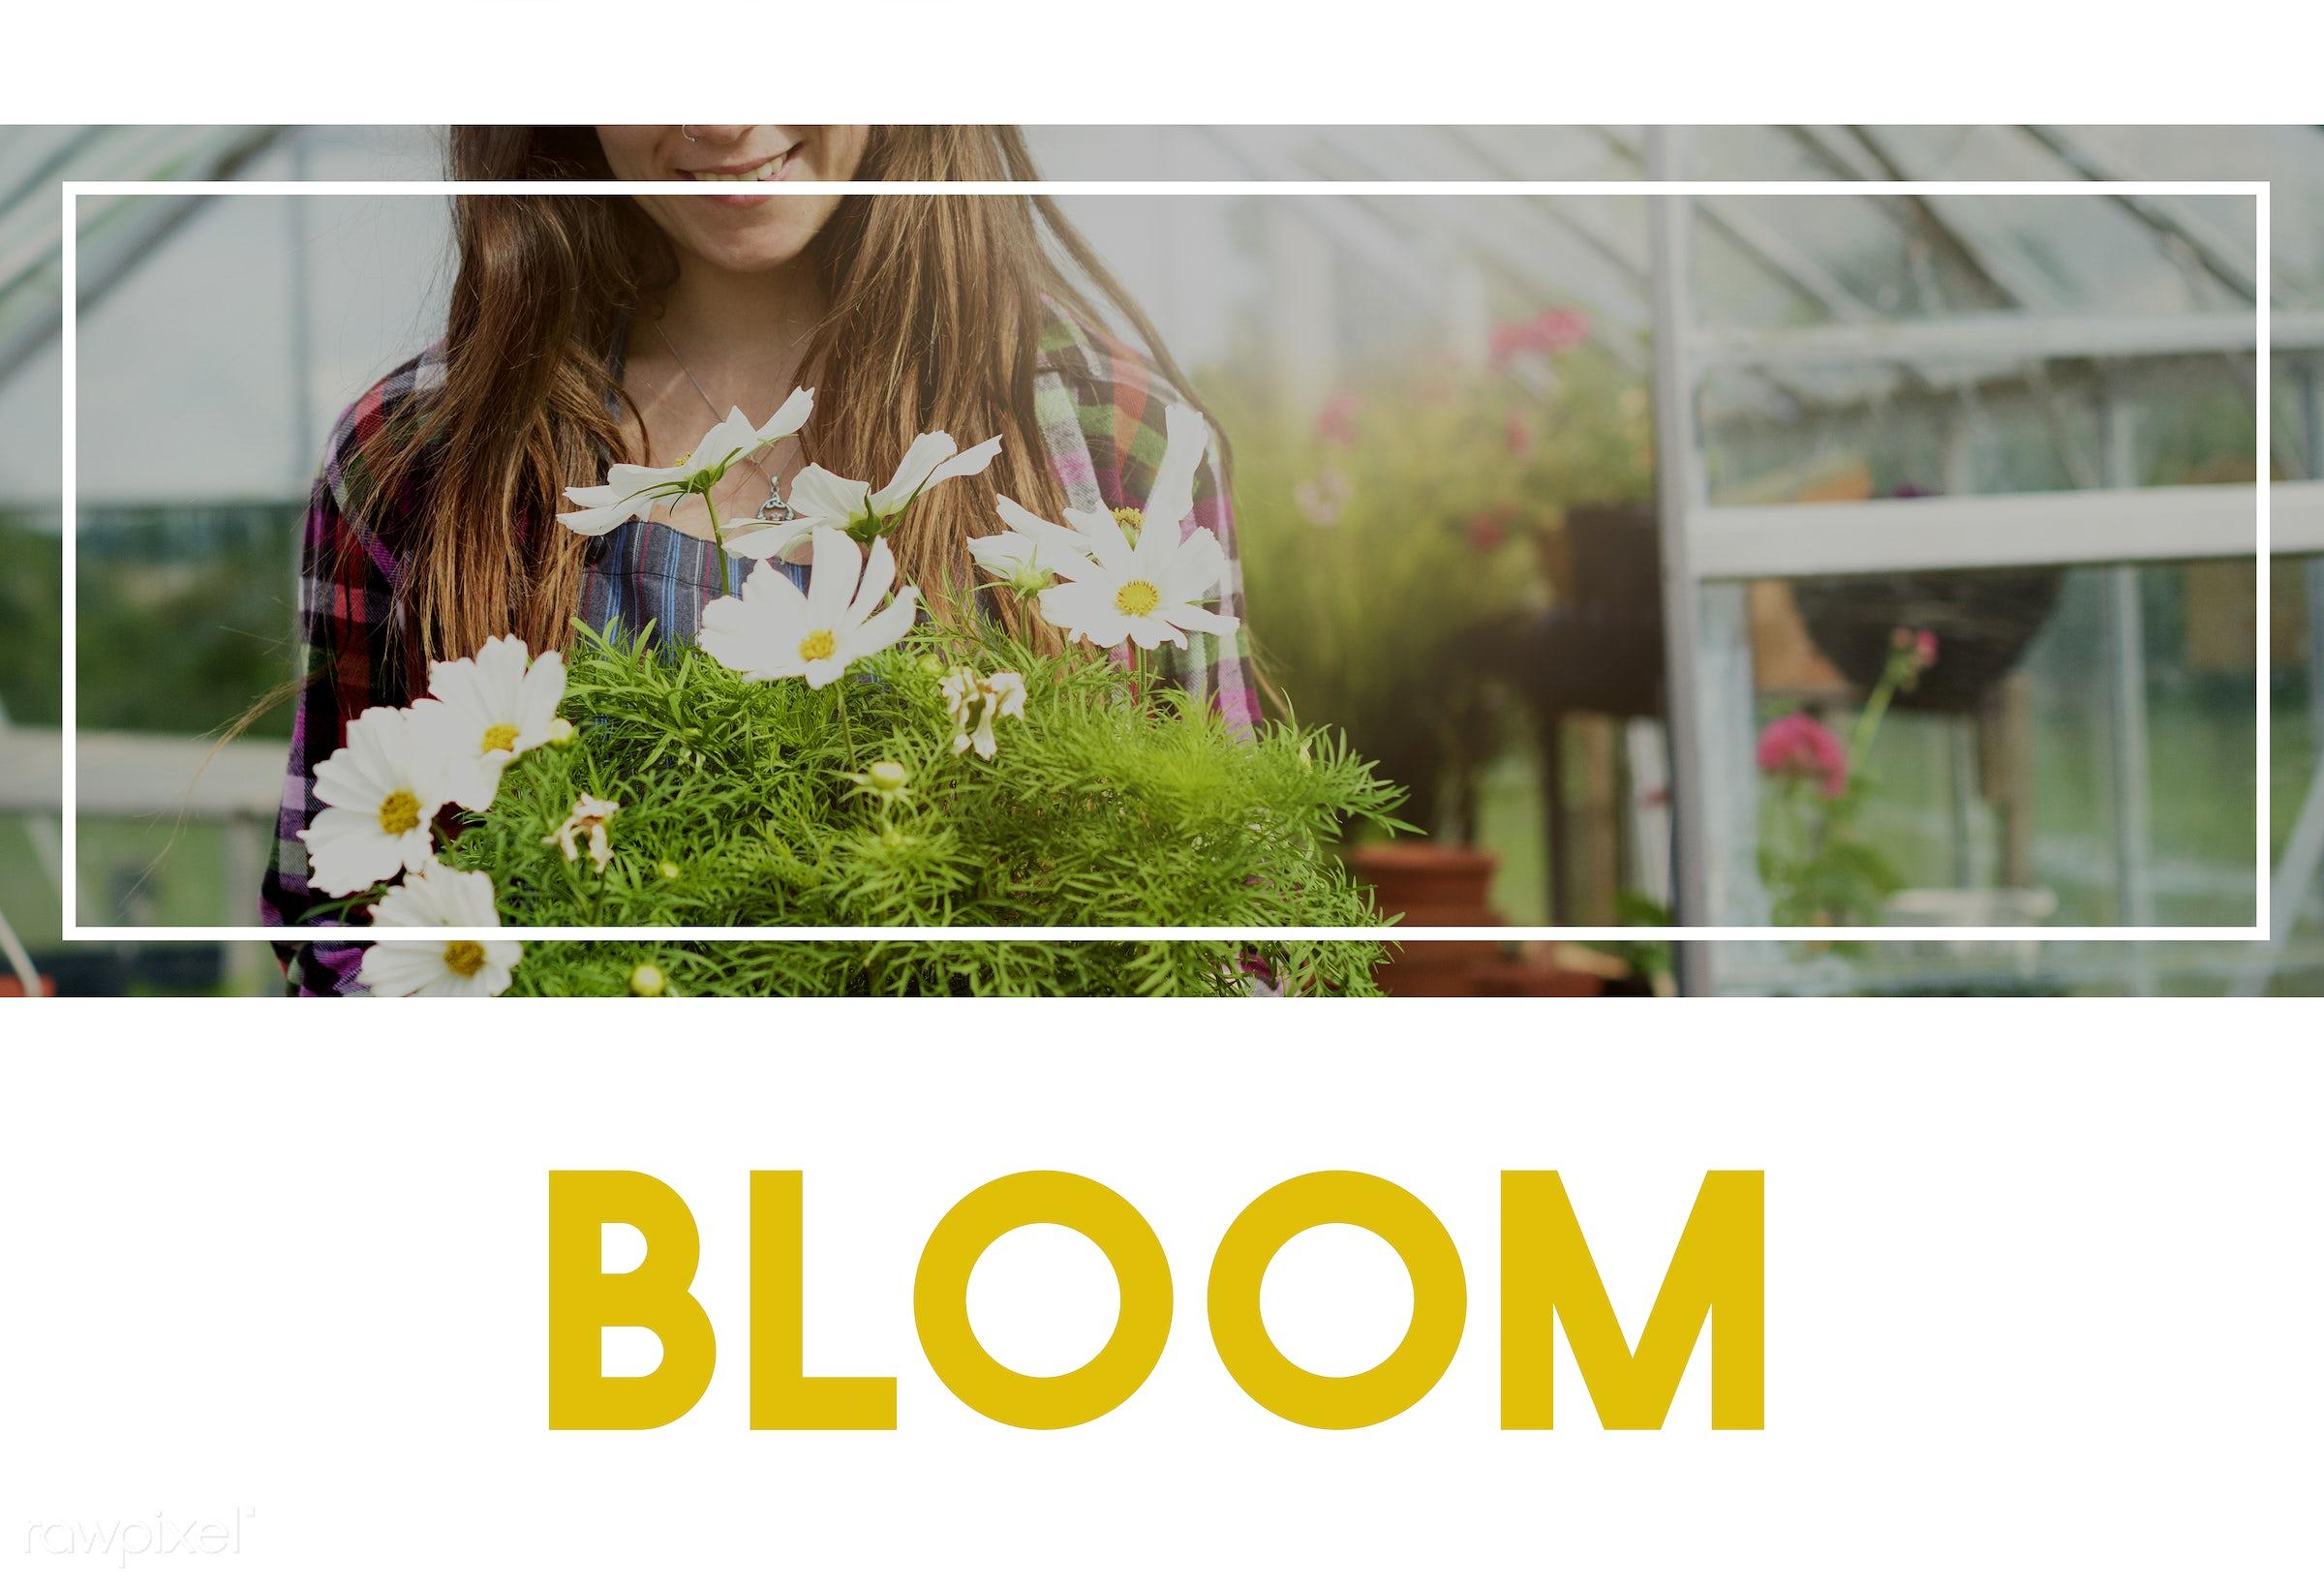 100% nature, always look on the bright side of life, apron, bloom, caucasian, dark blonde, female, flowerpot, flowers, fresh...